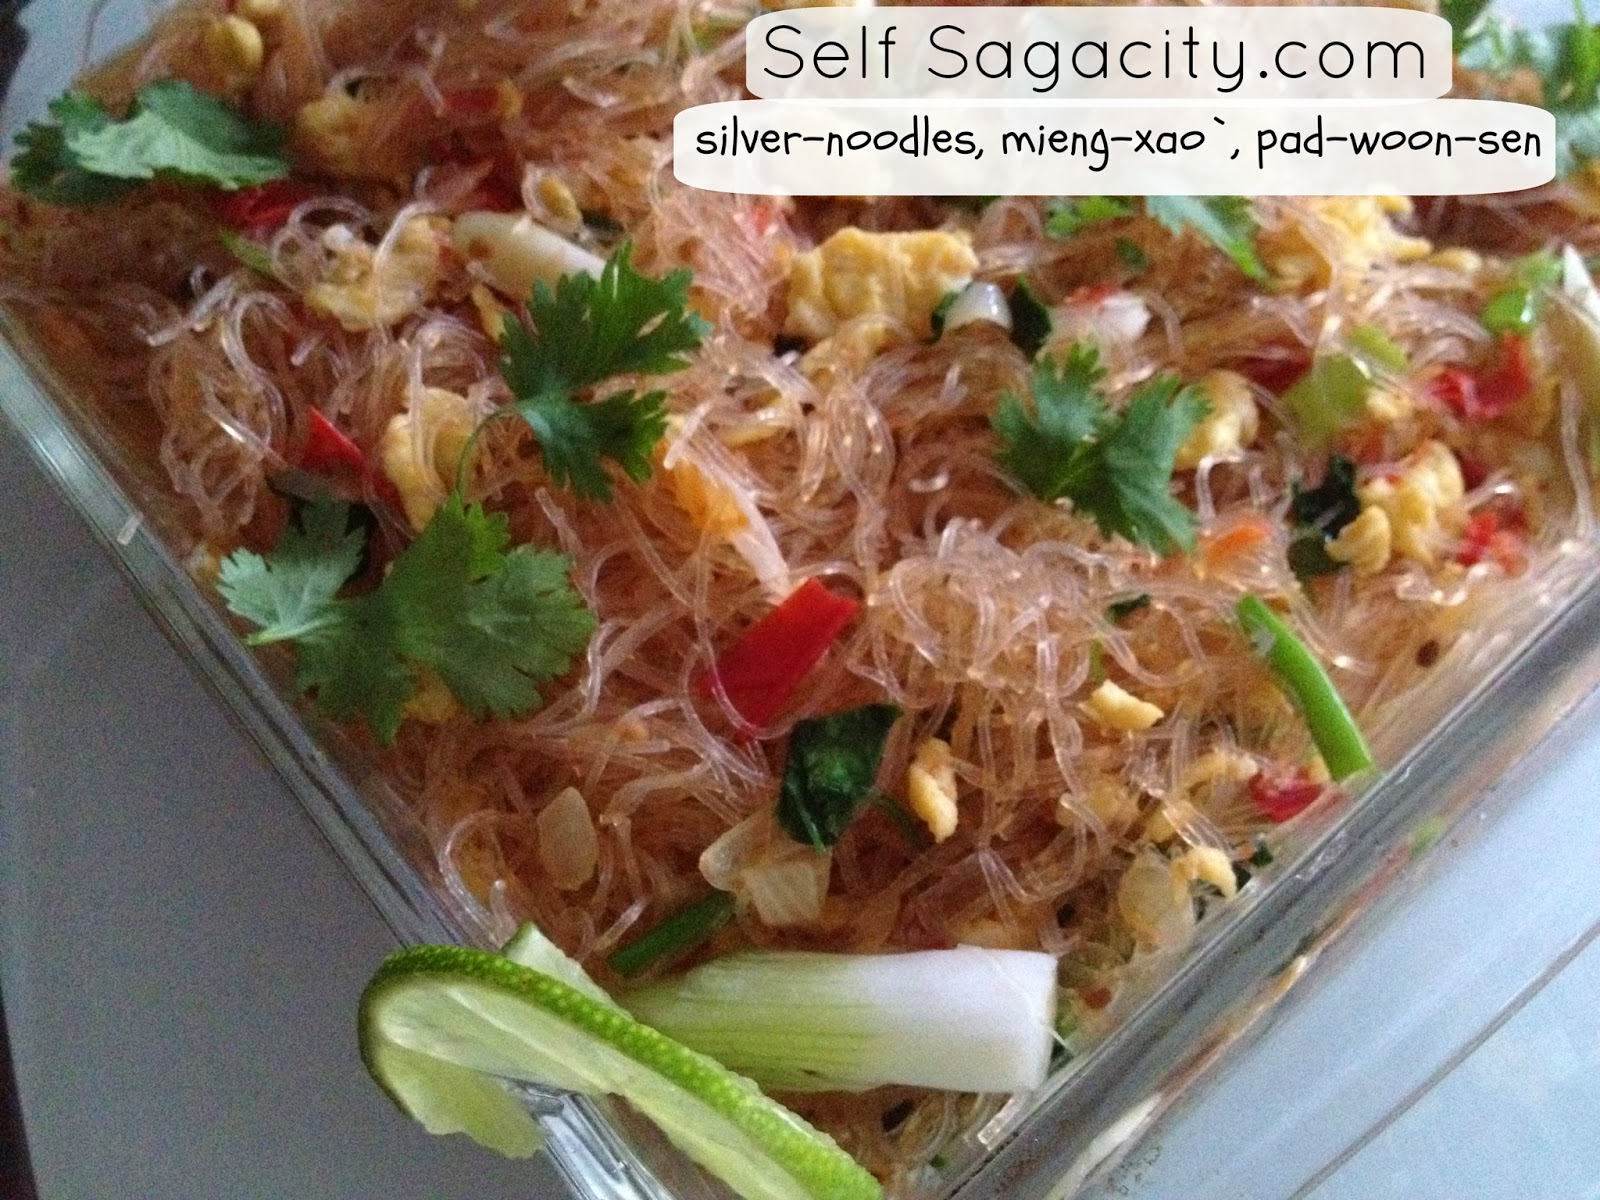 PadWoonSen MienXao Silver Noodles Vegetarain Recipe